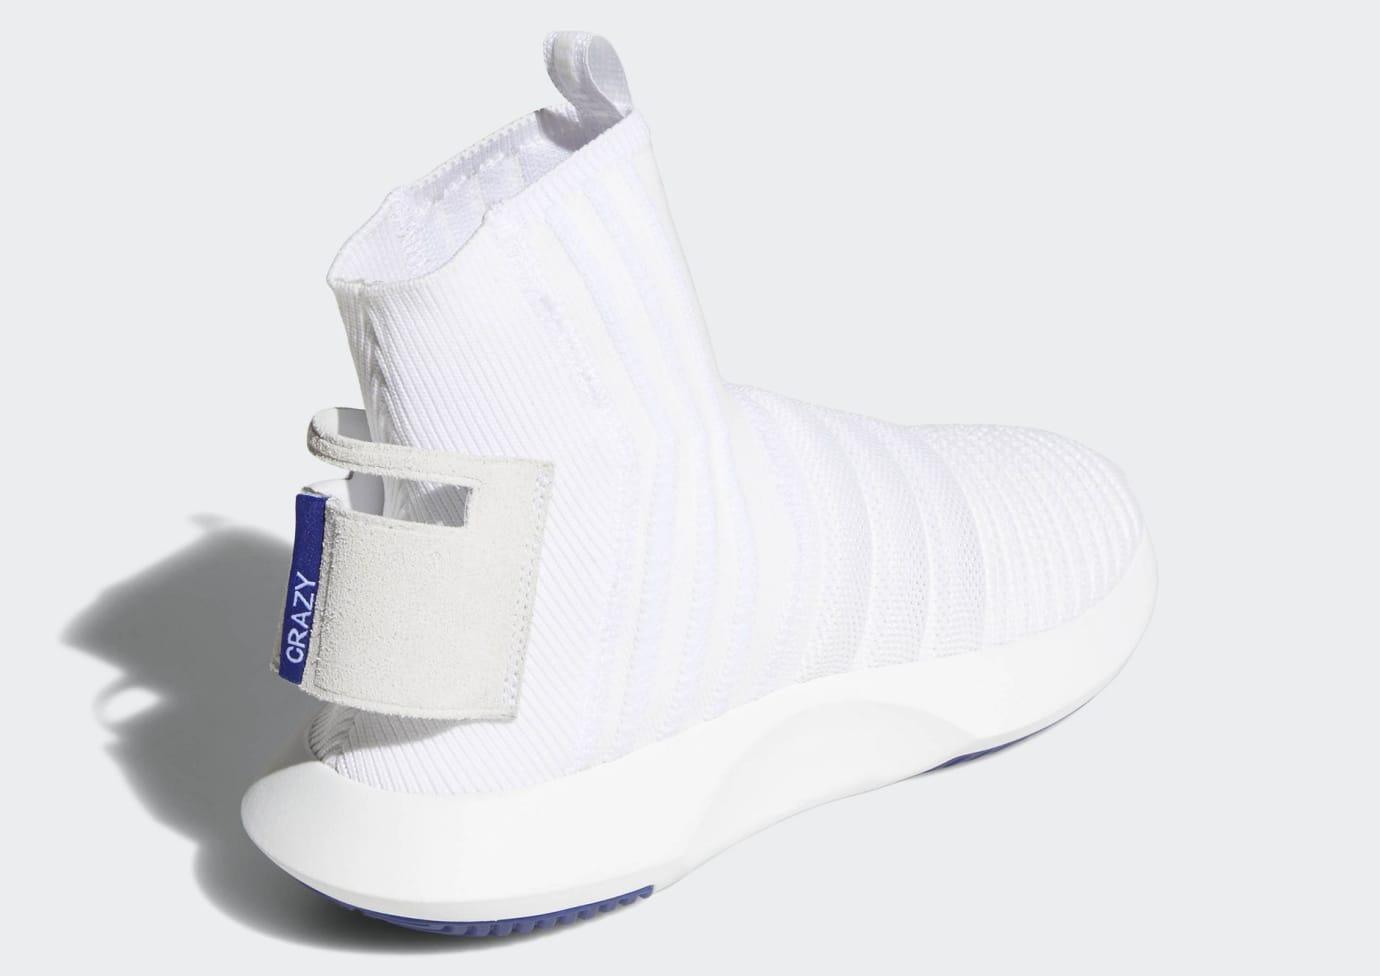 premium selection e9572 b1800 Image via Adidas adidas-crazy-1-adv-sock-primeknit